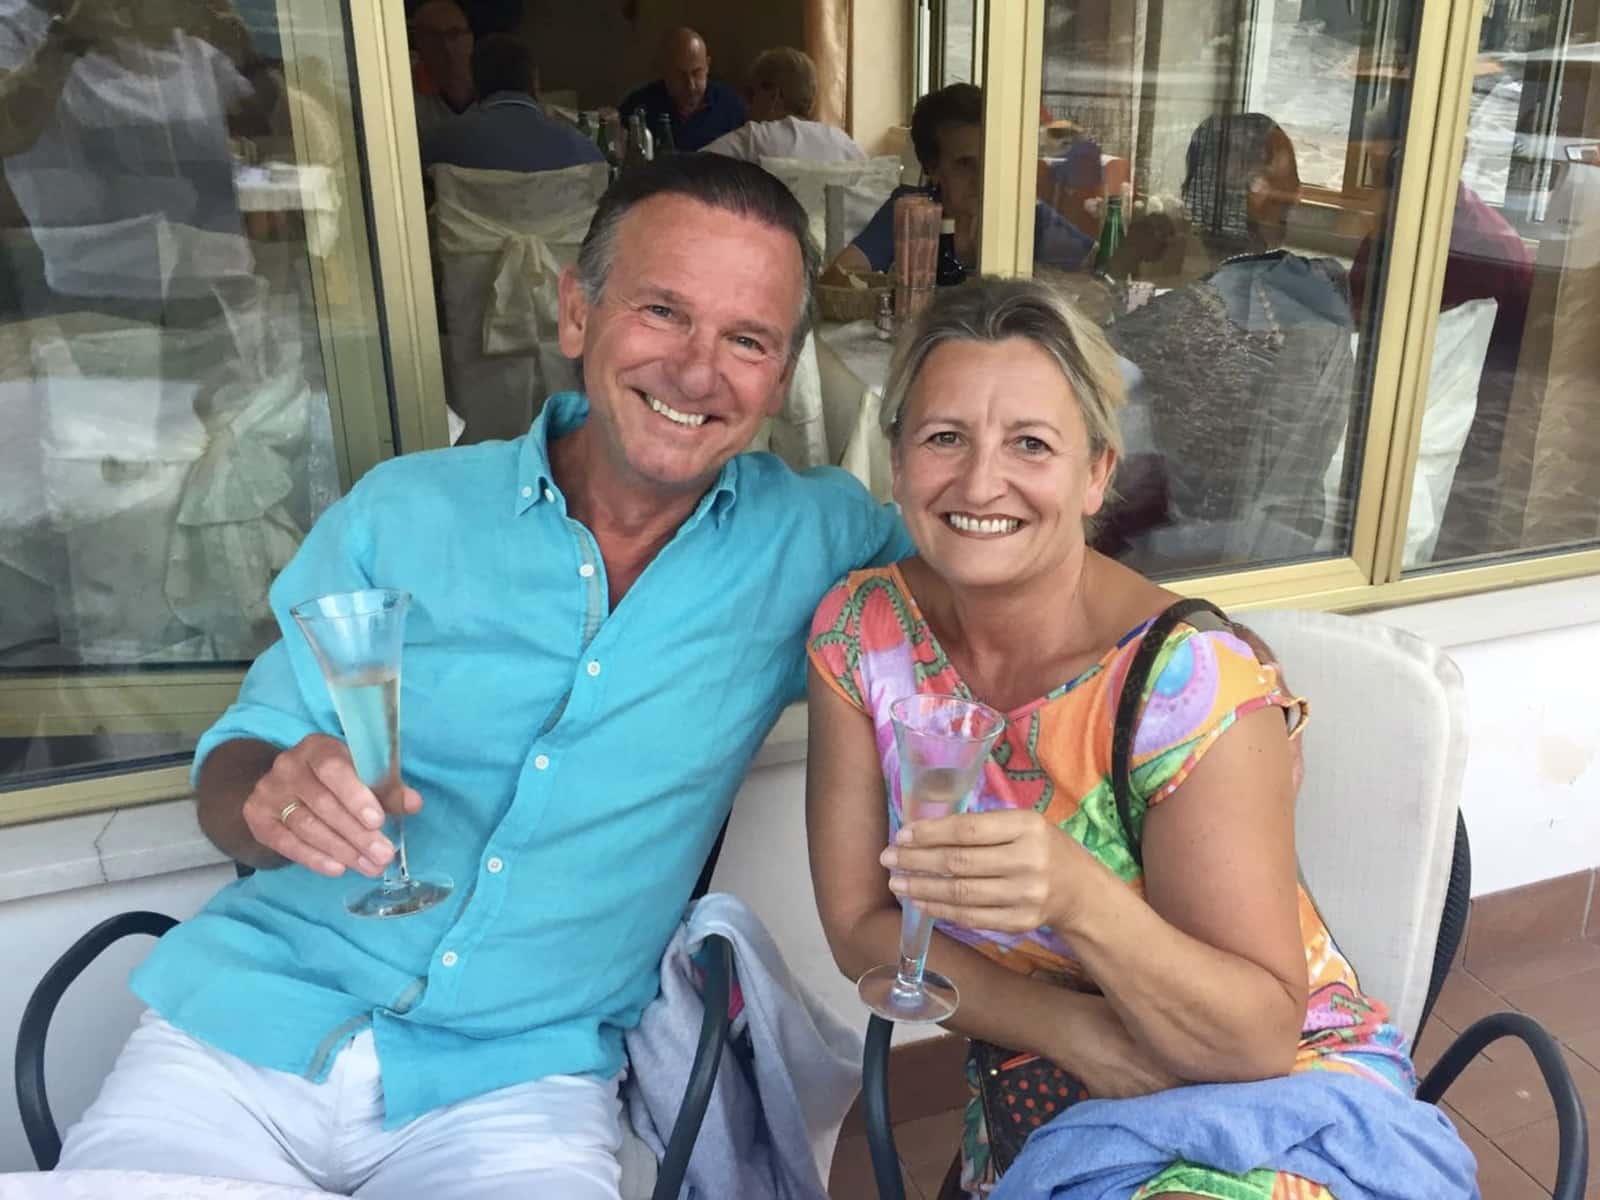 Eddie & Martina from Munich, Germany